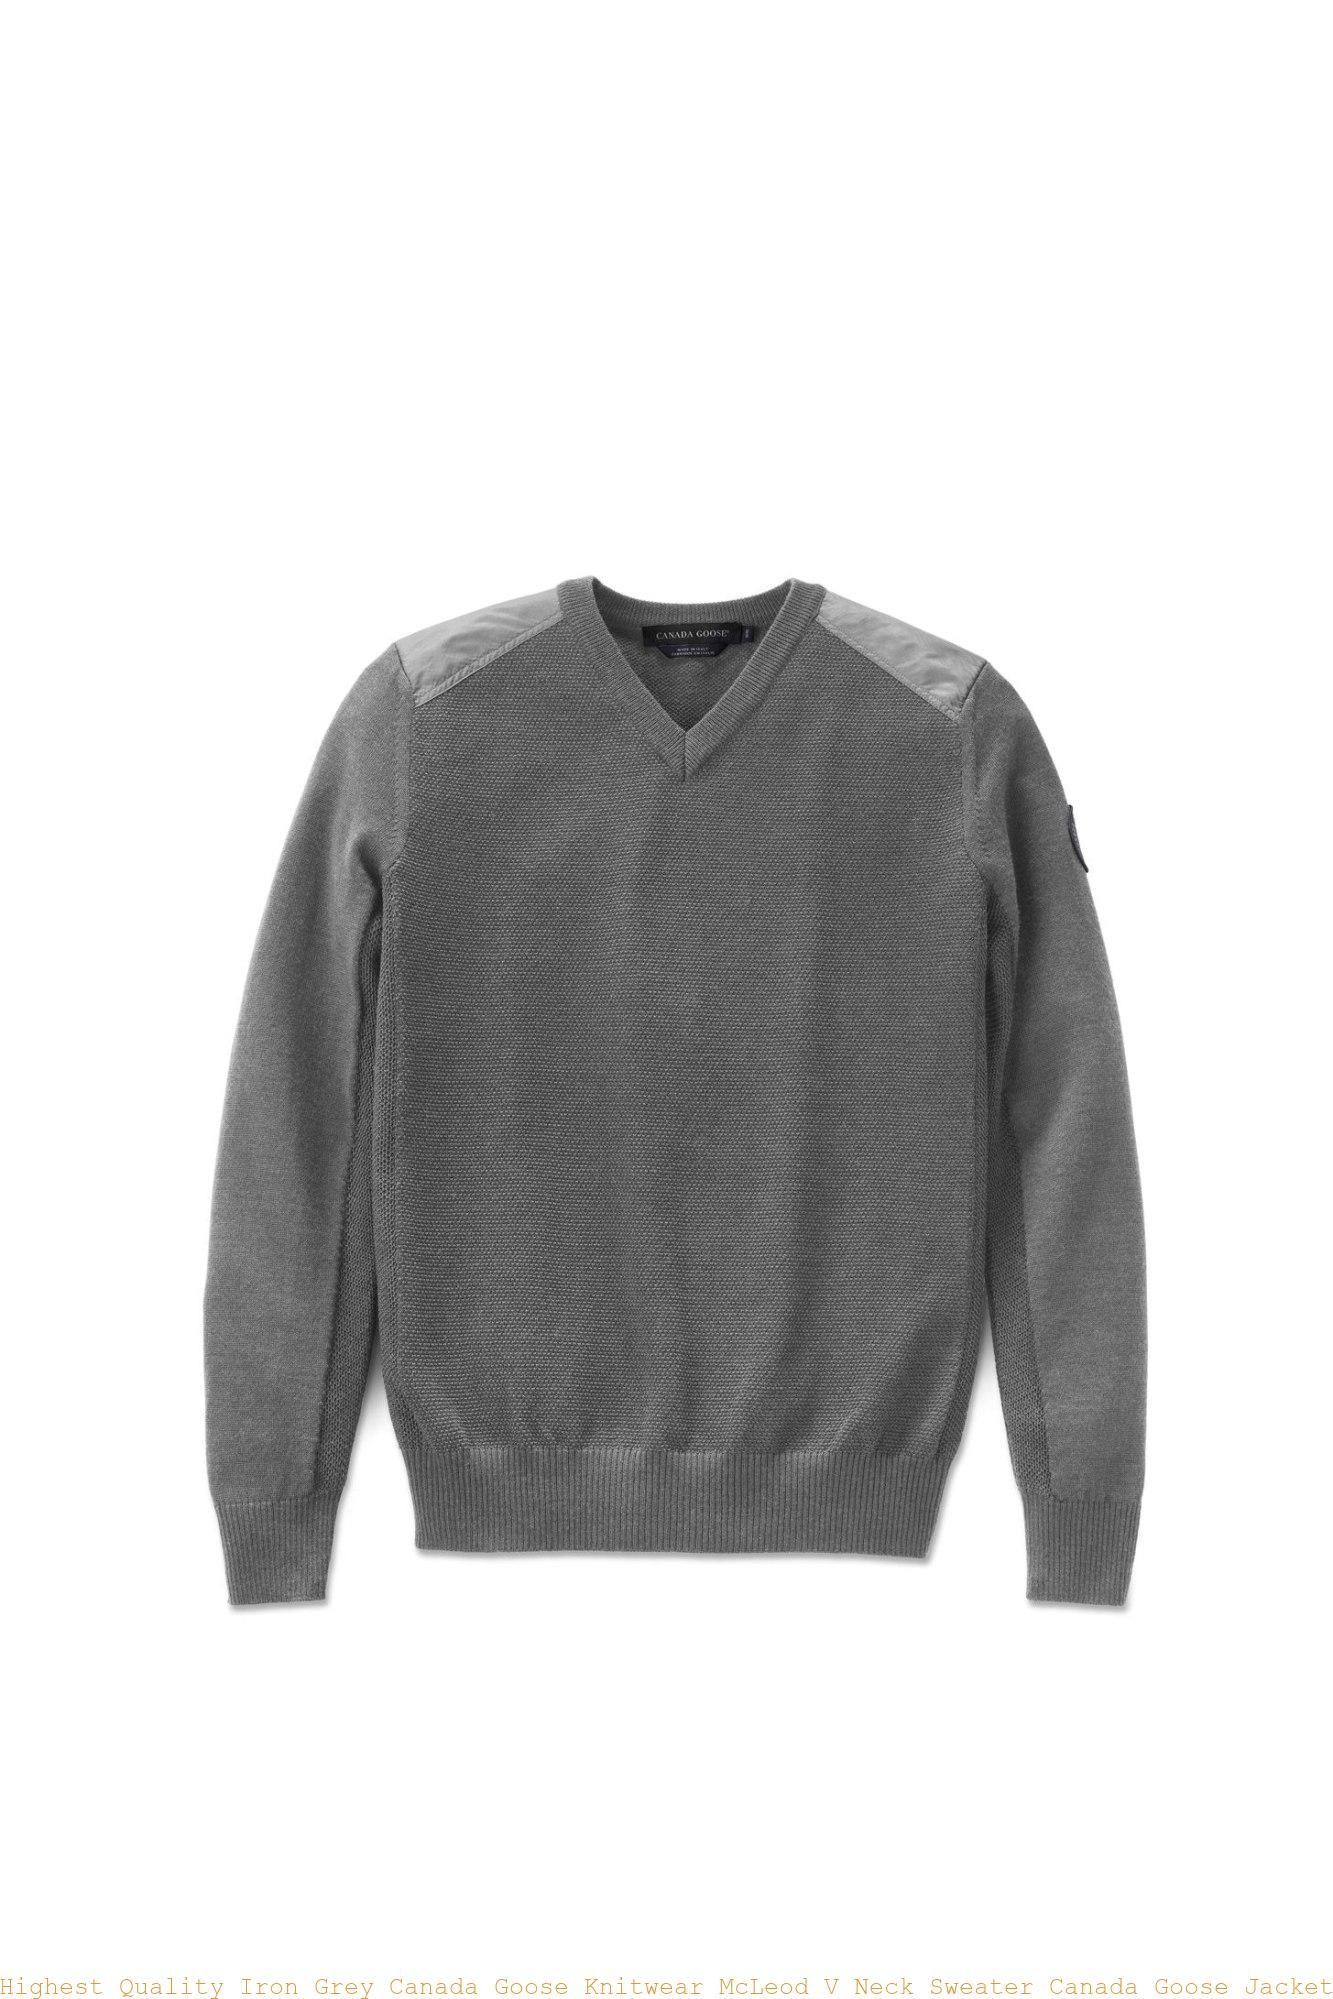 https://www.cagoosestores.ca/wp-content/uploads/2019/01/Highest-Quality-Iron-Grey-Canada-Goose-Knitwear-McLeod-V-Neck-Sweater-Canada-Goose-Jacket-Black-Friday-Sale-Uk-6965M-3.jpg